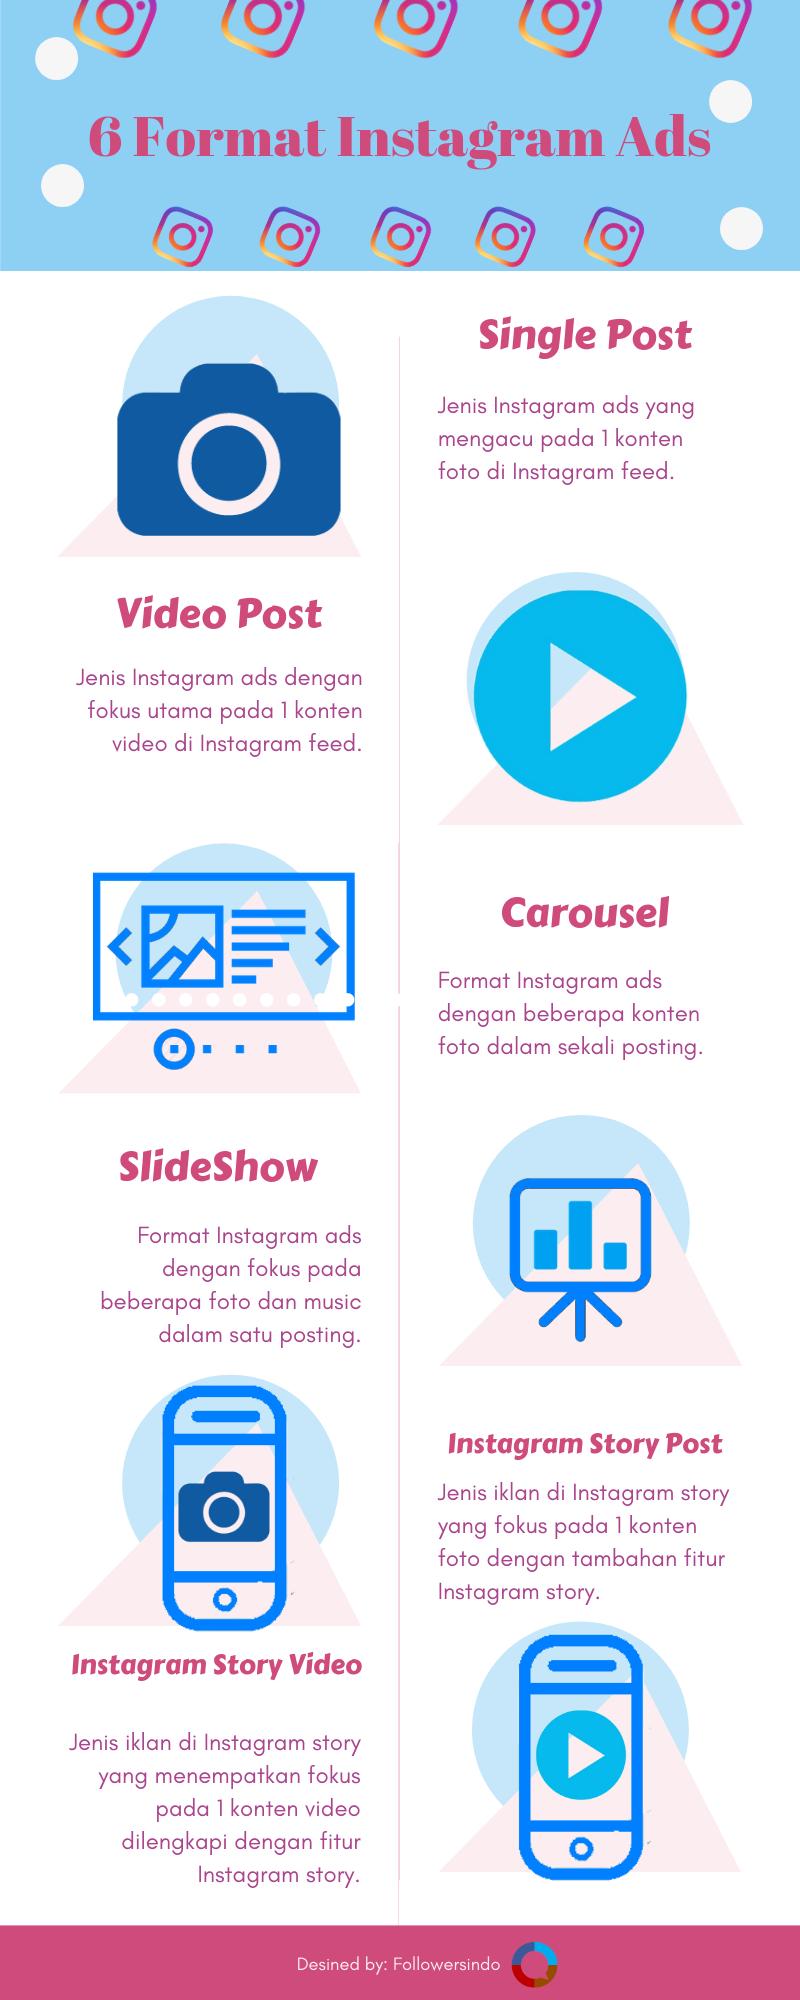 6 format Instagram Ads